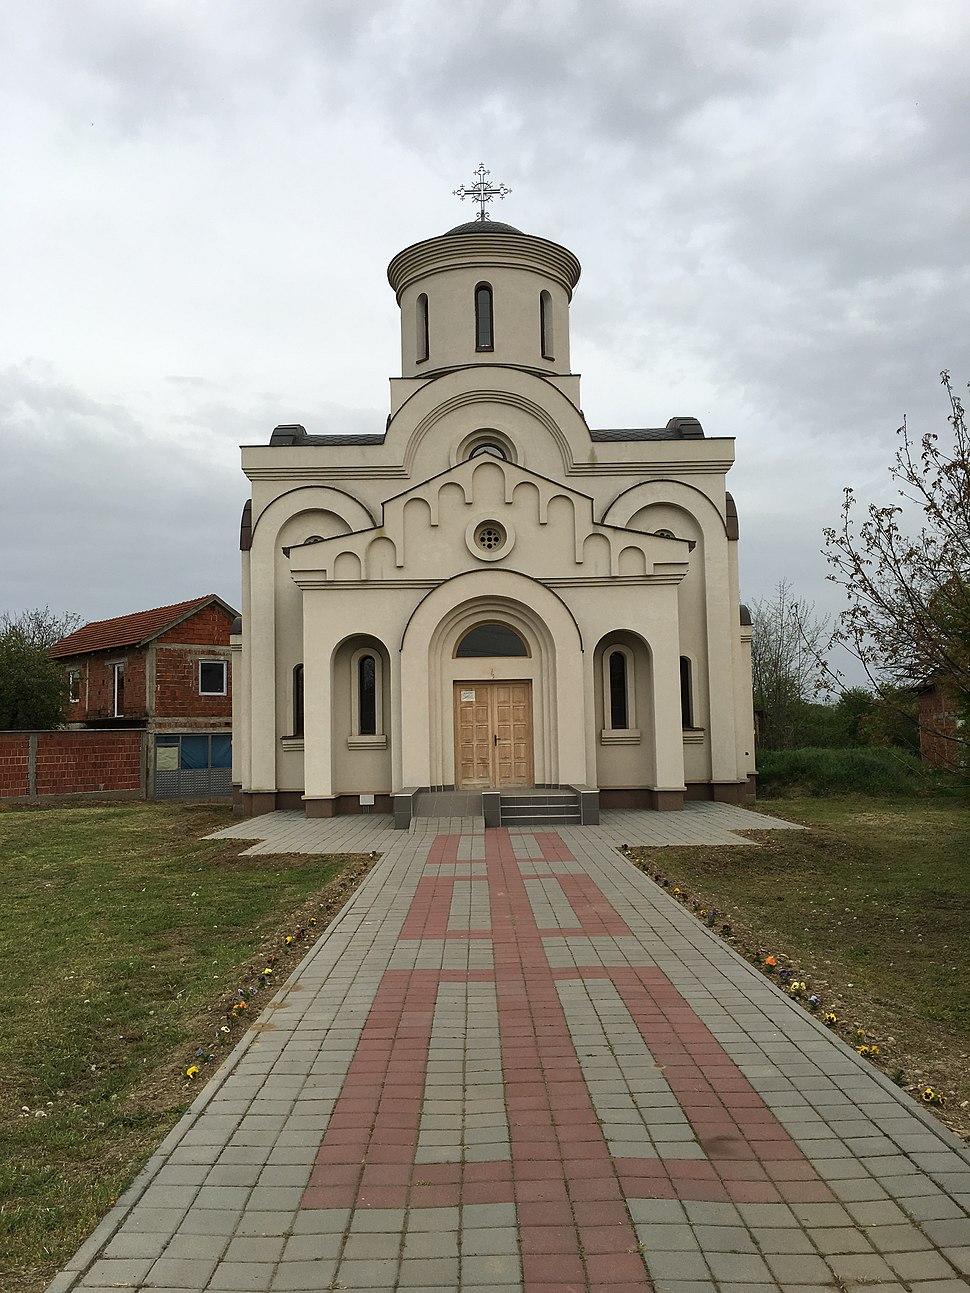 Crkva Svetog Nikole, Bojnik, Leskovac 23